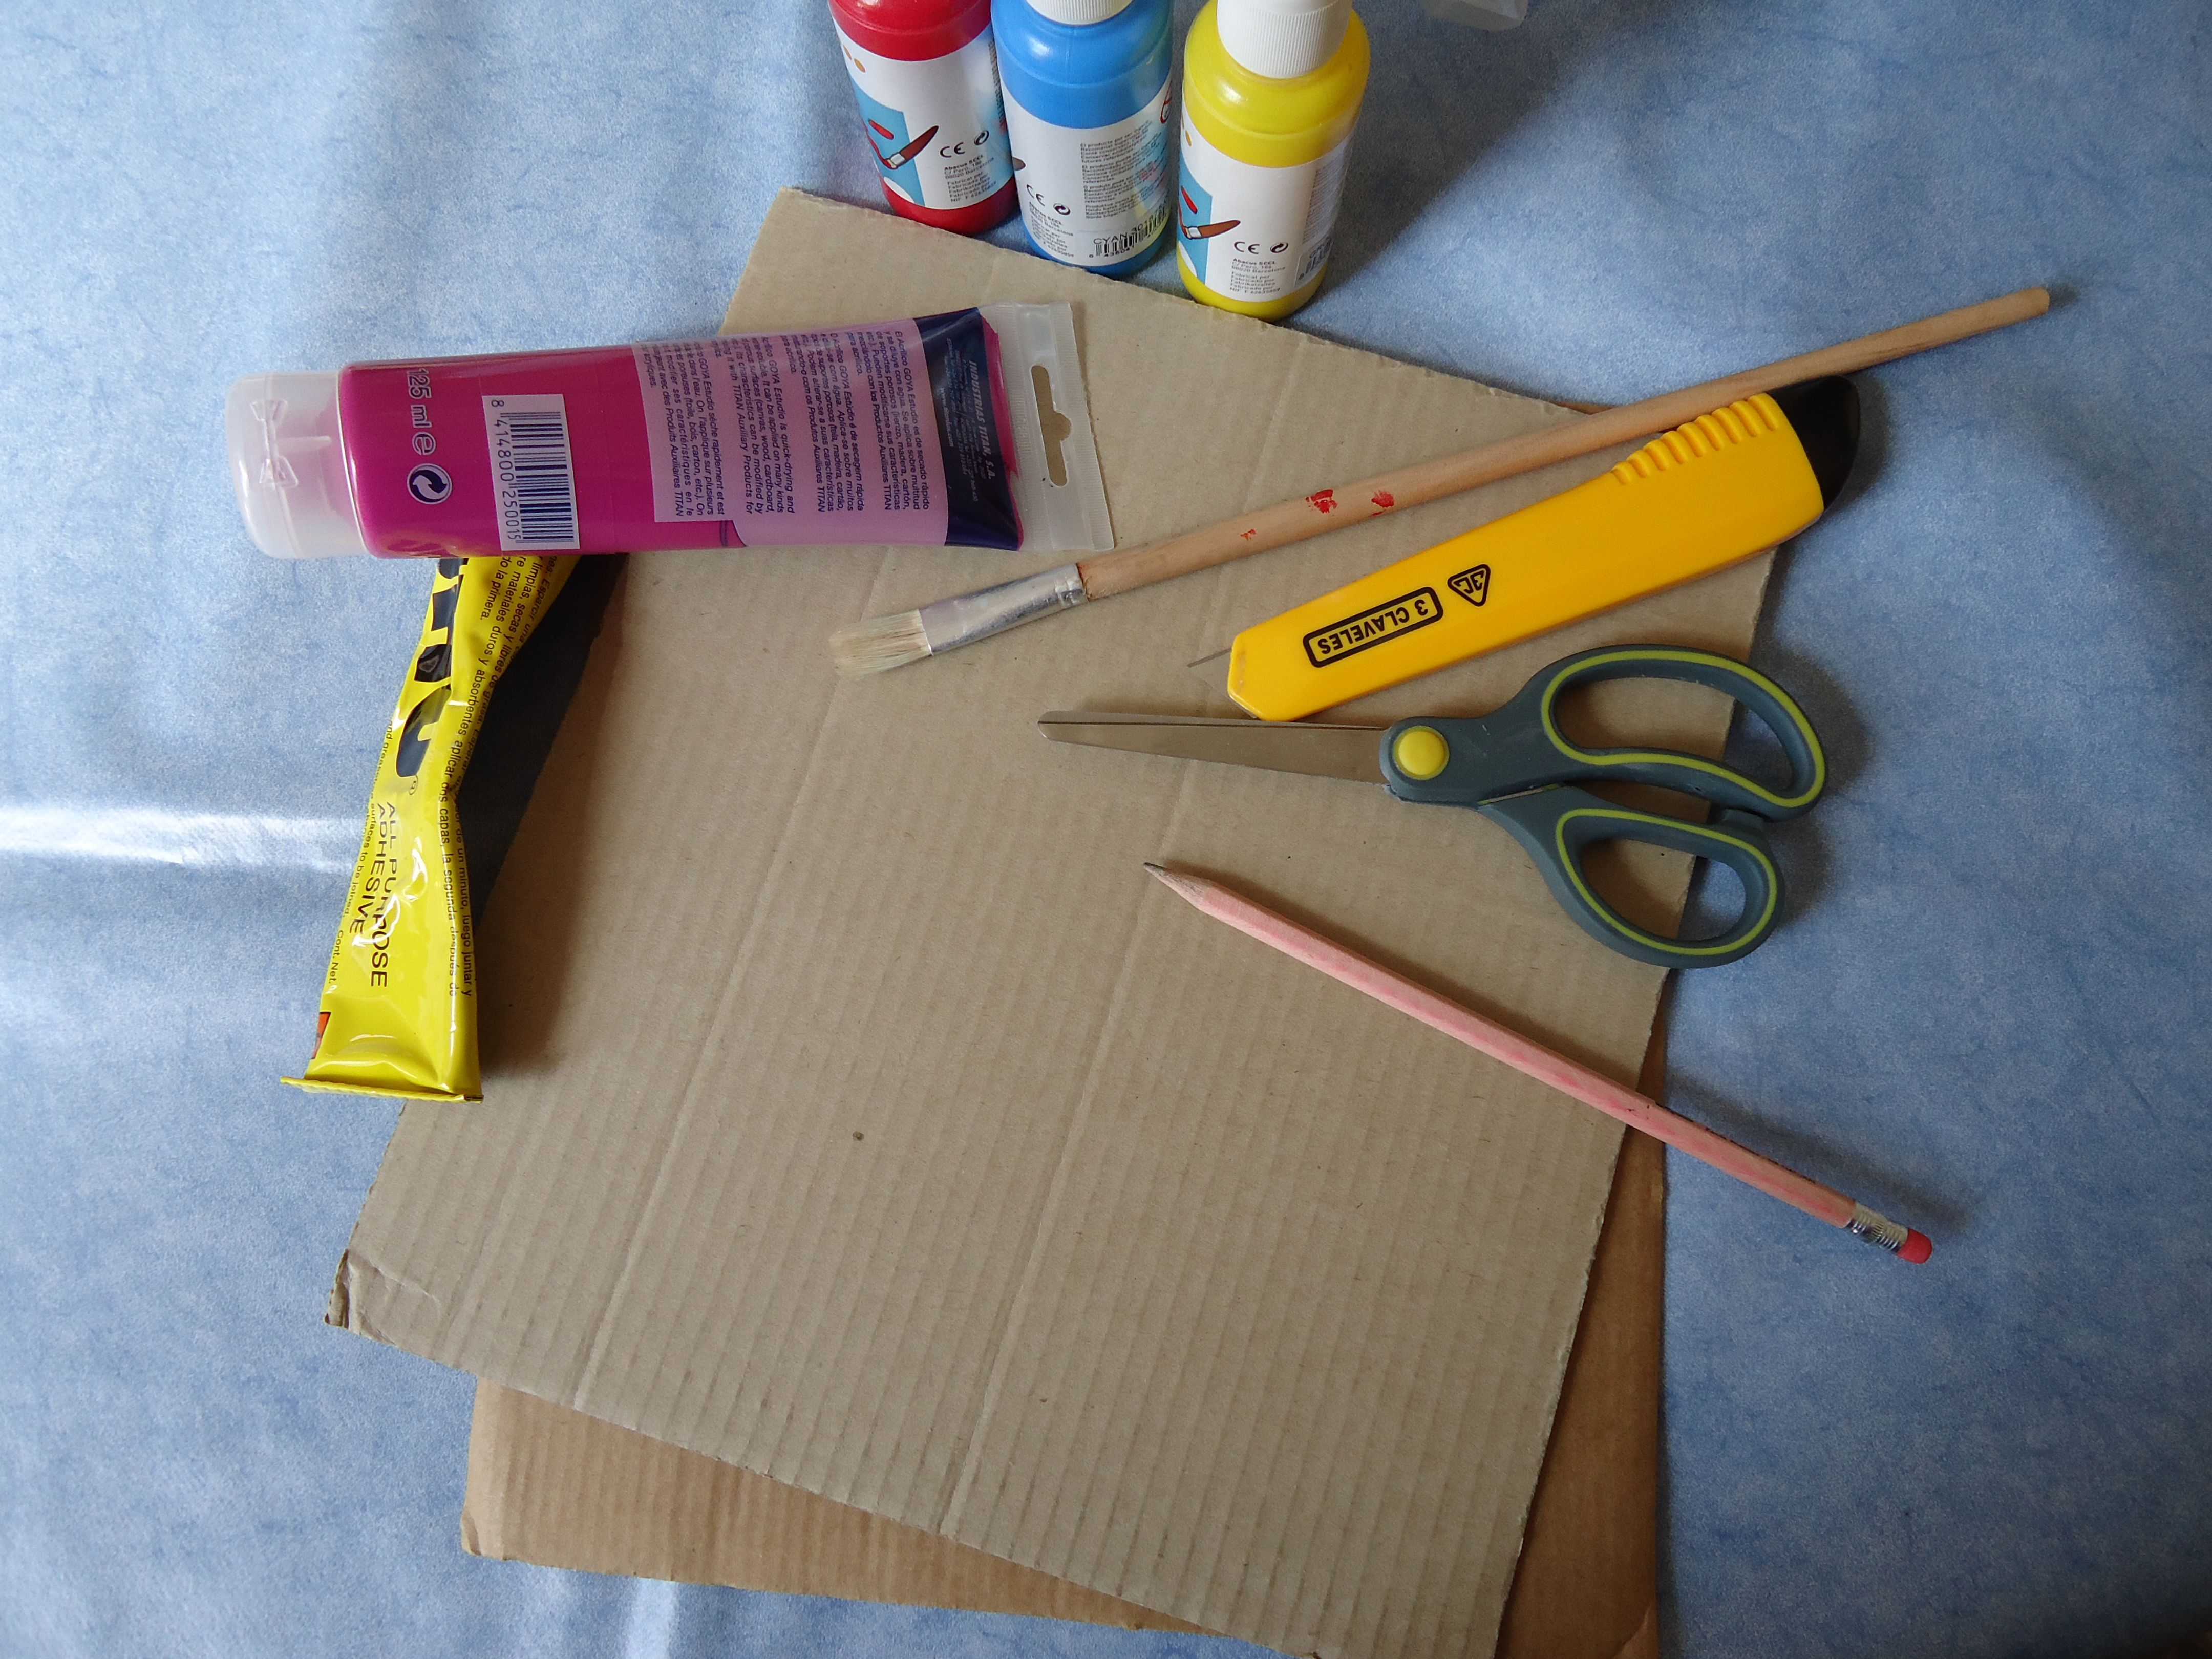 Paso a paso para hacer un portarretratos de cartón